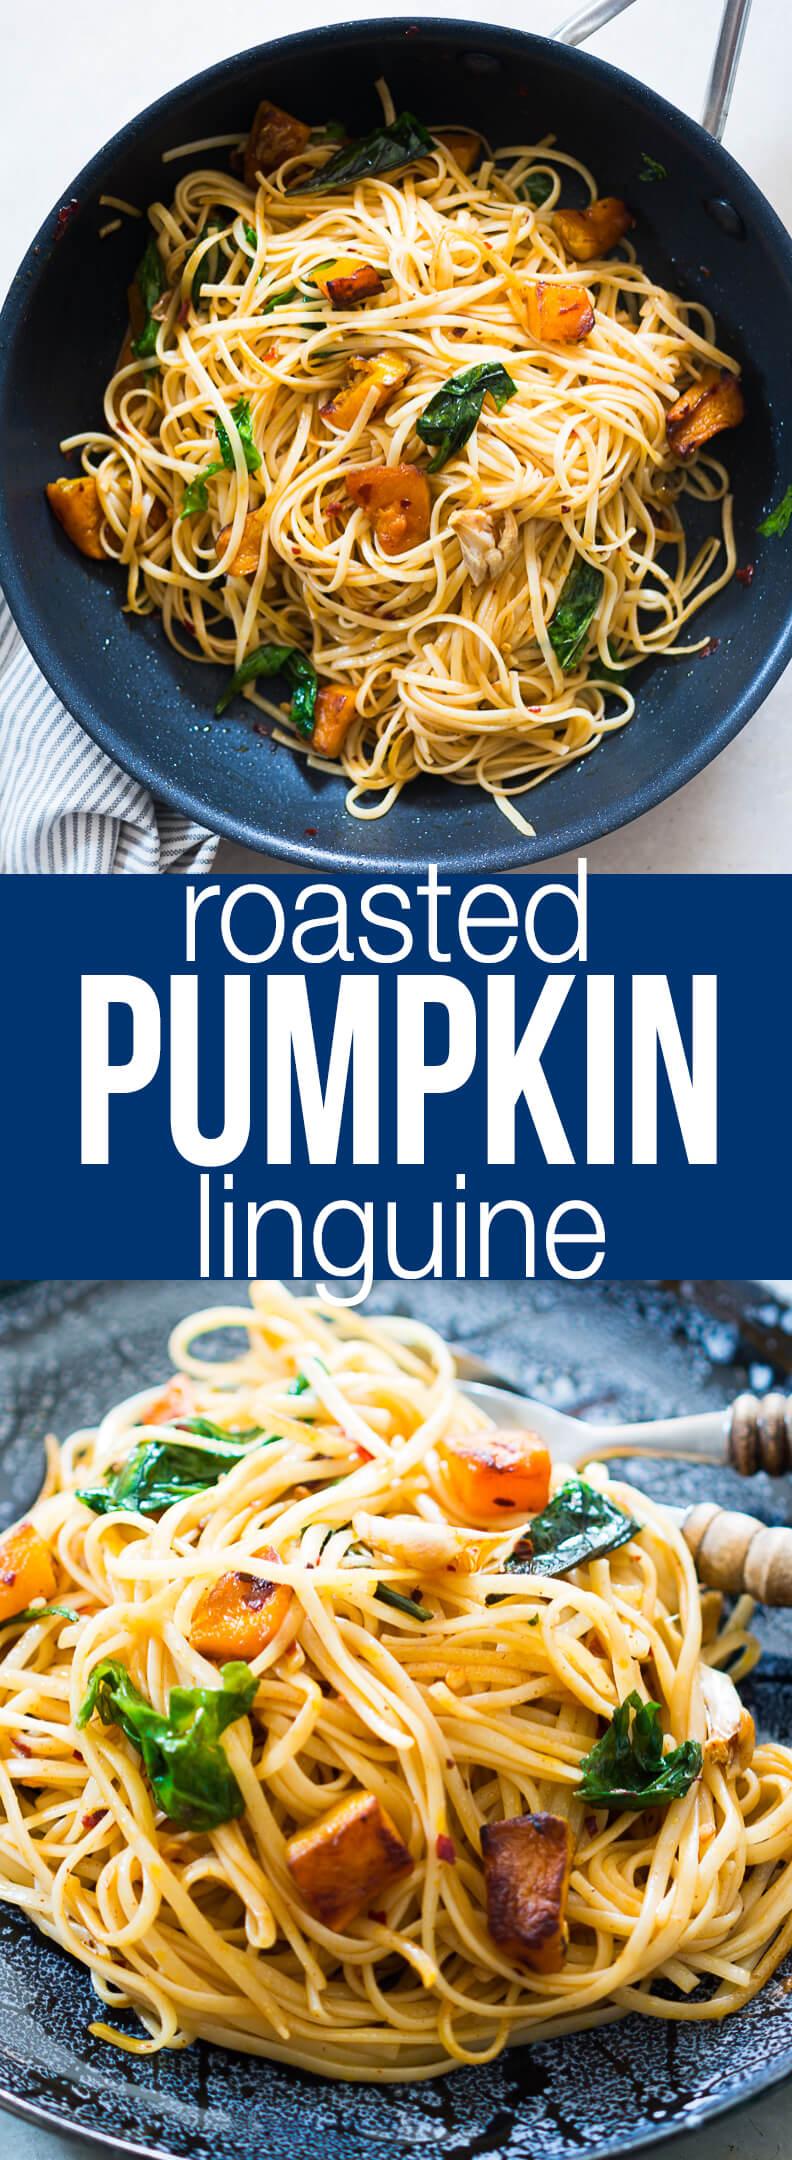 Roasted Pumpkin Spinach Linguine